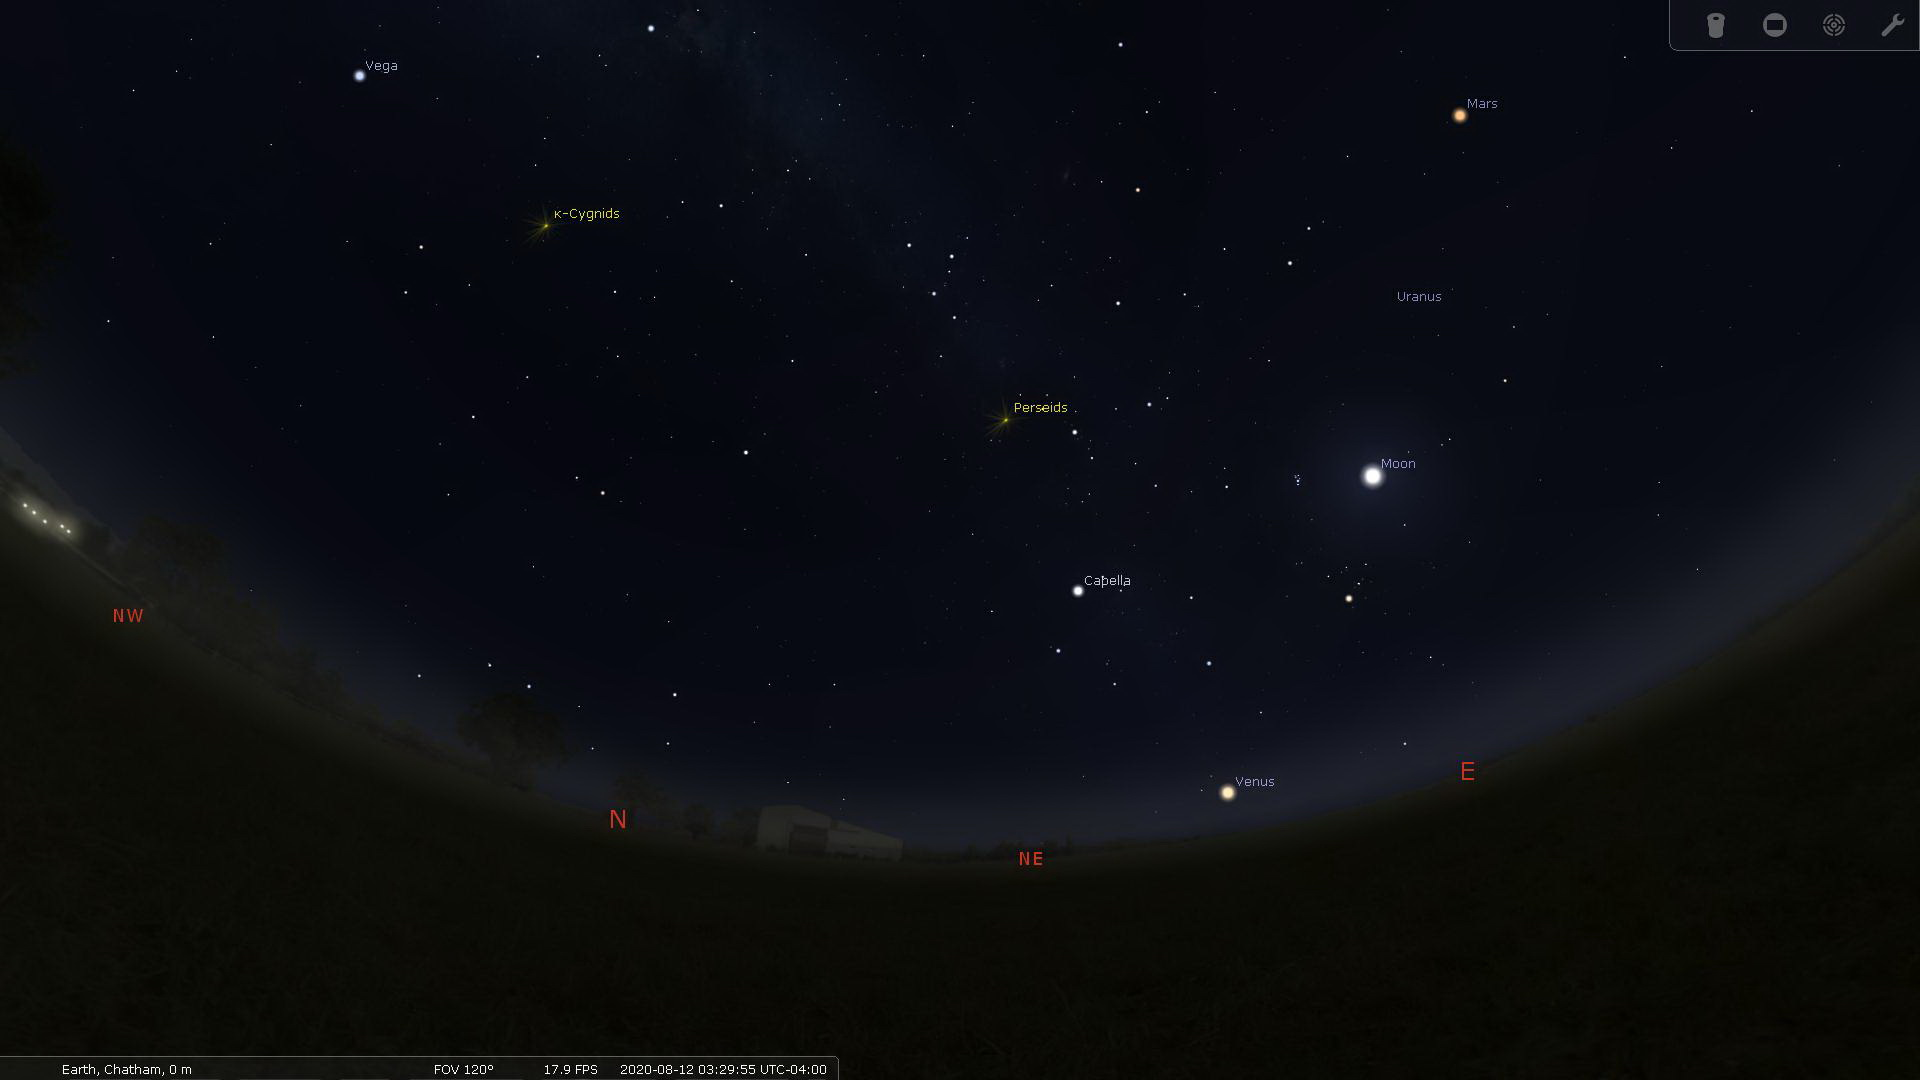 Perseid Meteor Shower radiant